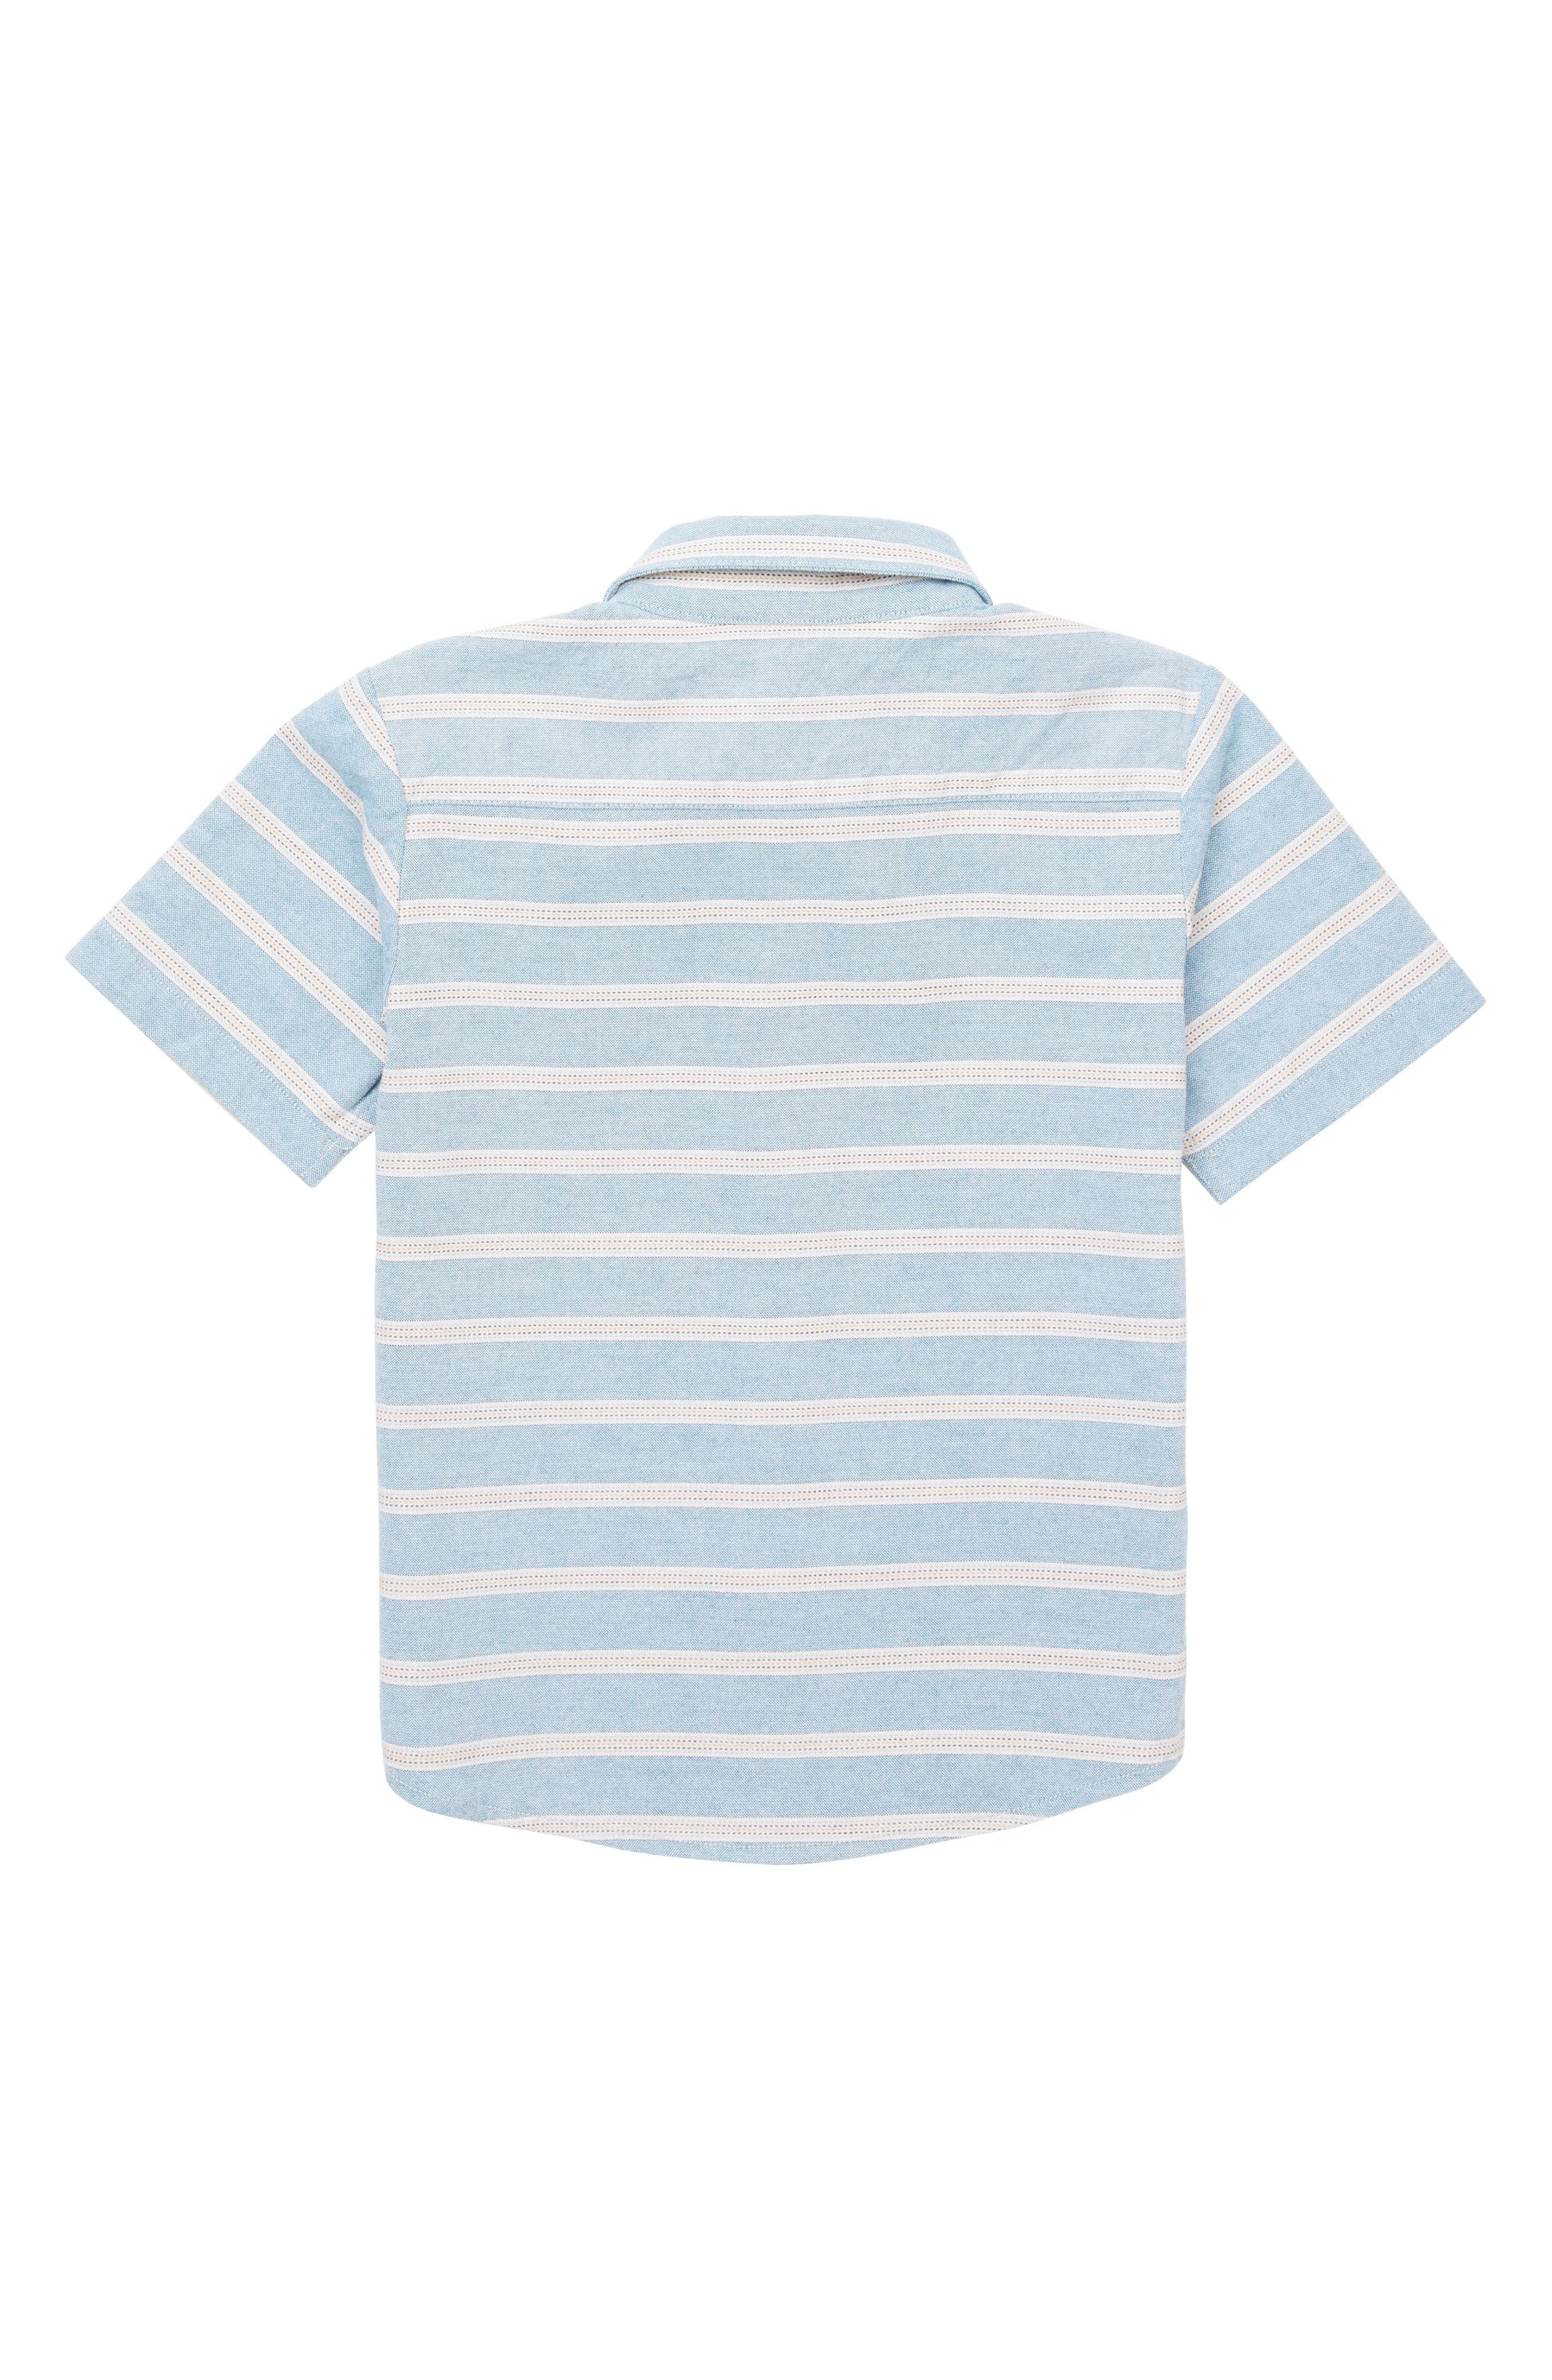 Branson Stripe Woven Shirt,                             Alternate thumbnail 2, color,                             400